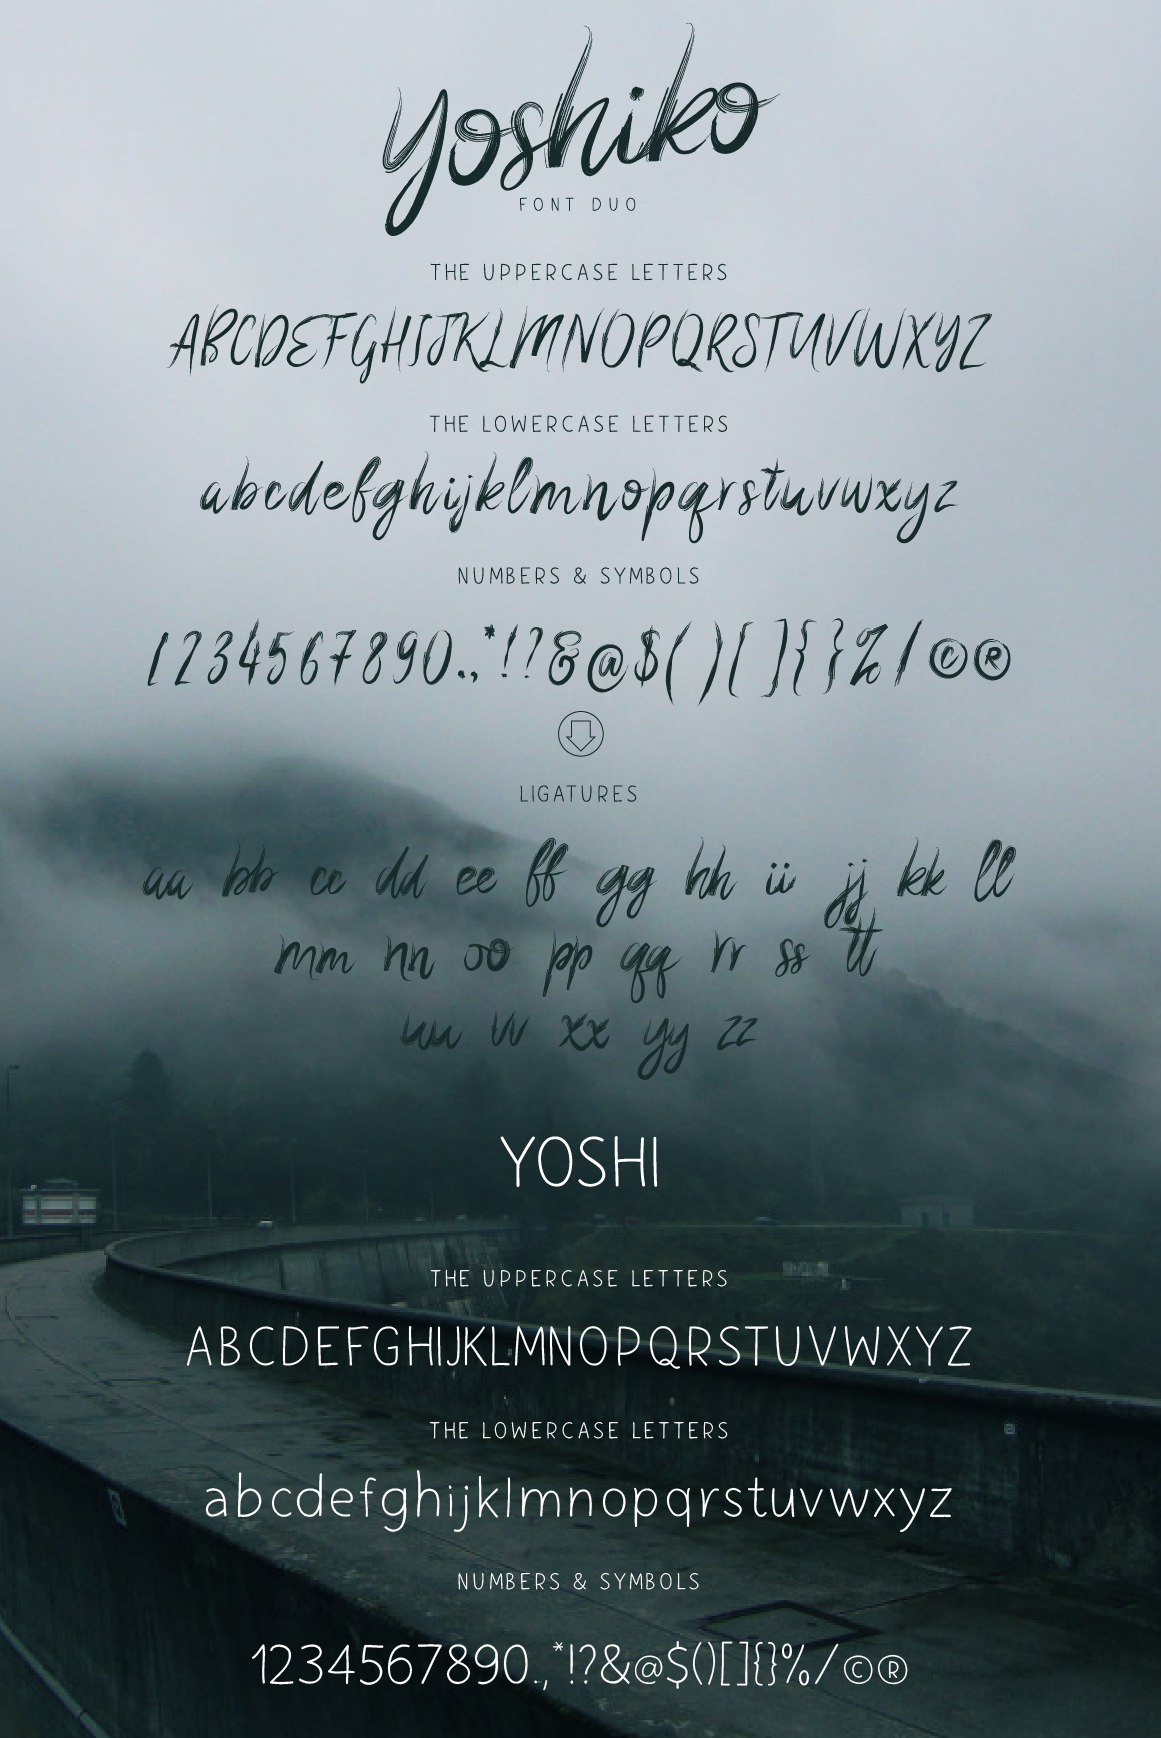 Yoshiko Font Duo example image 5